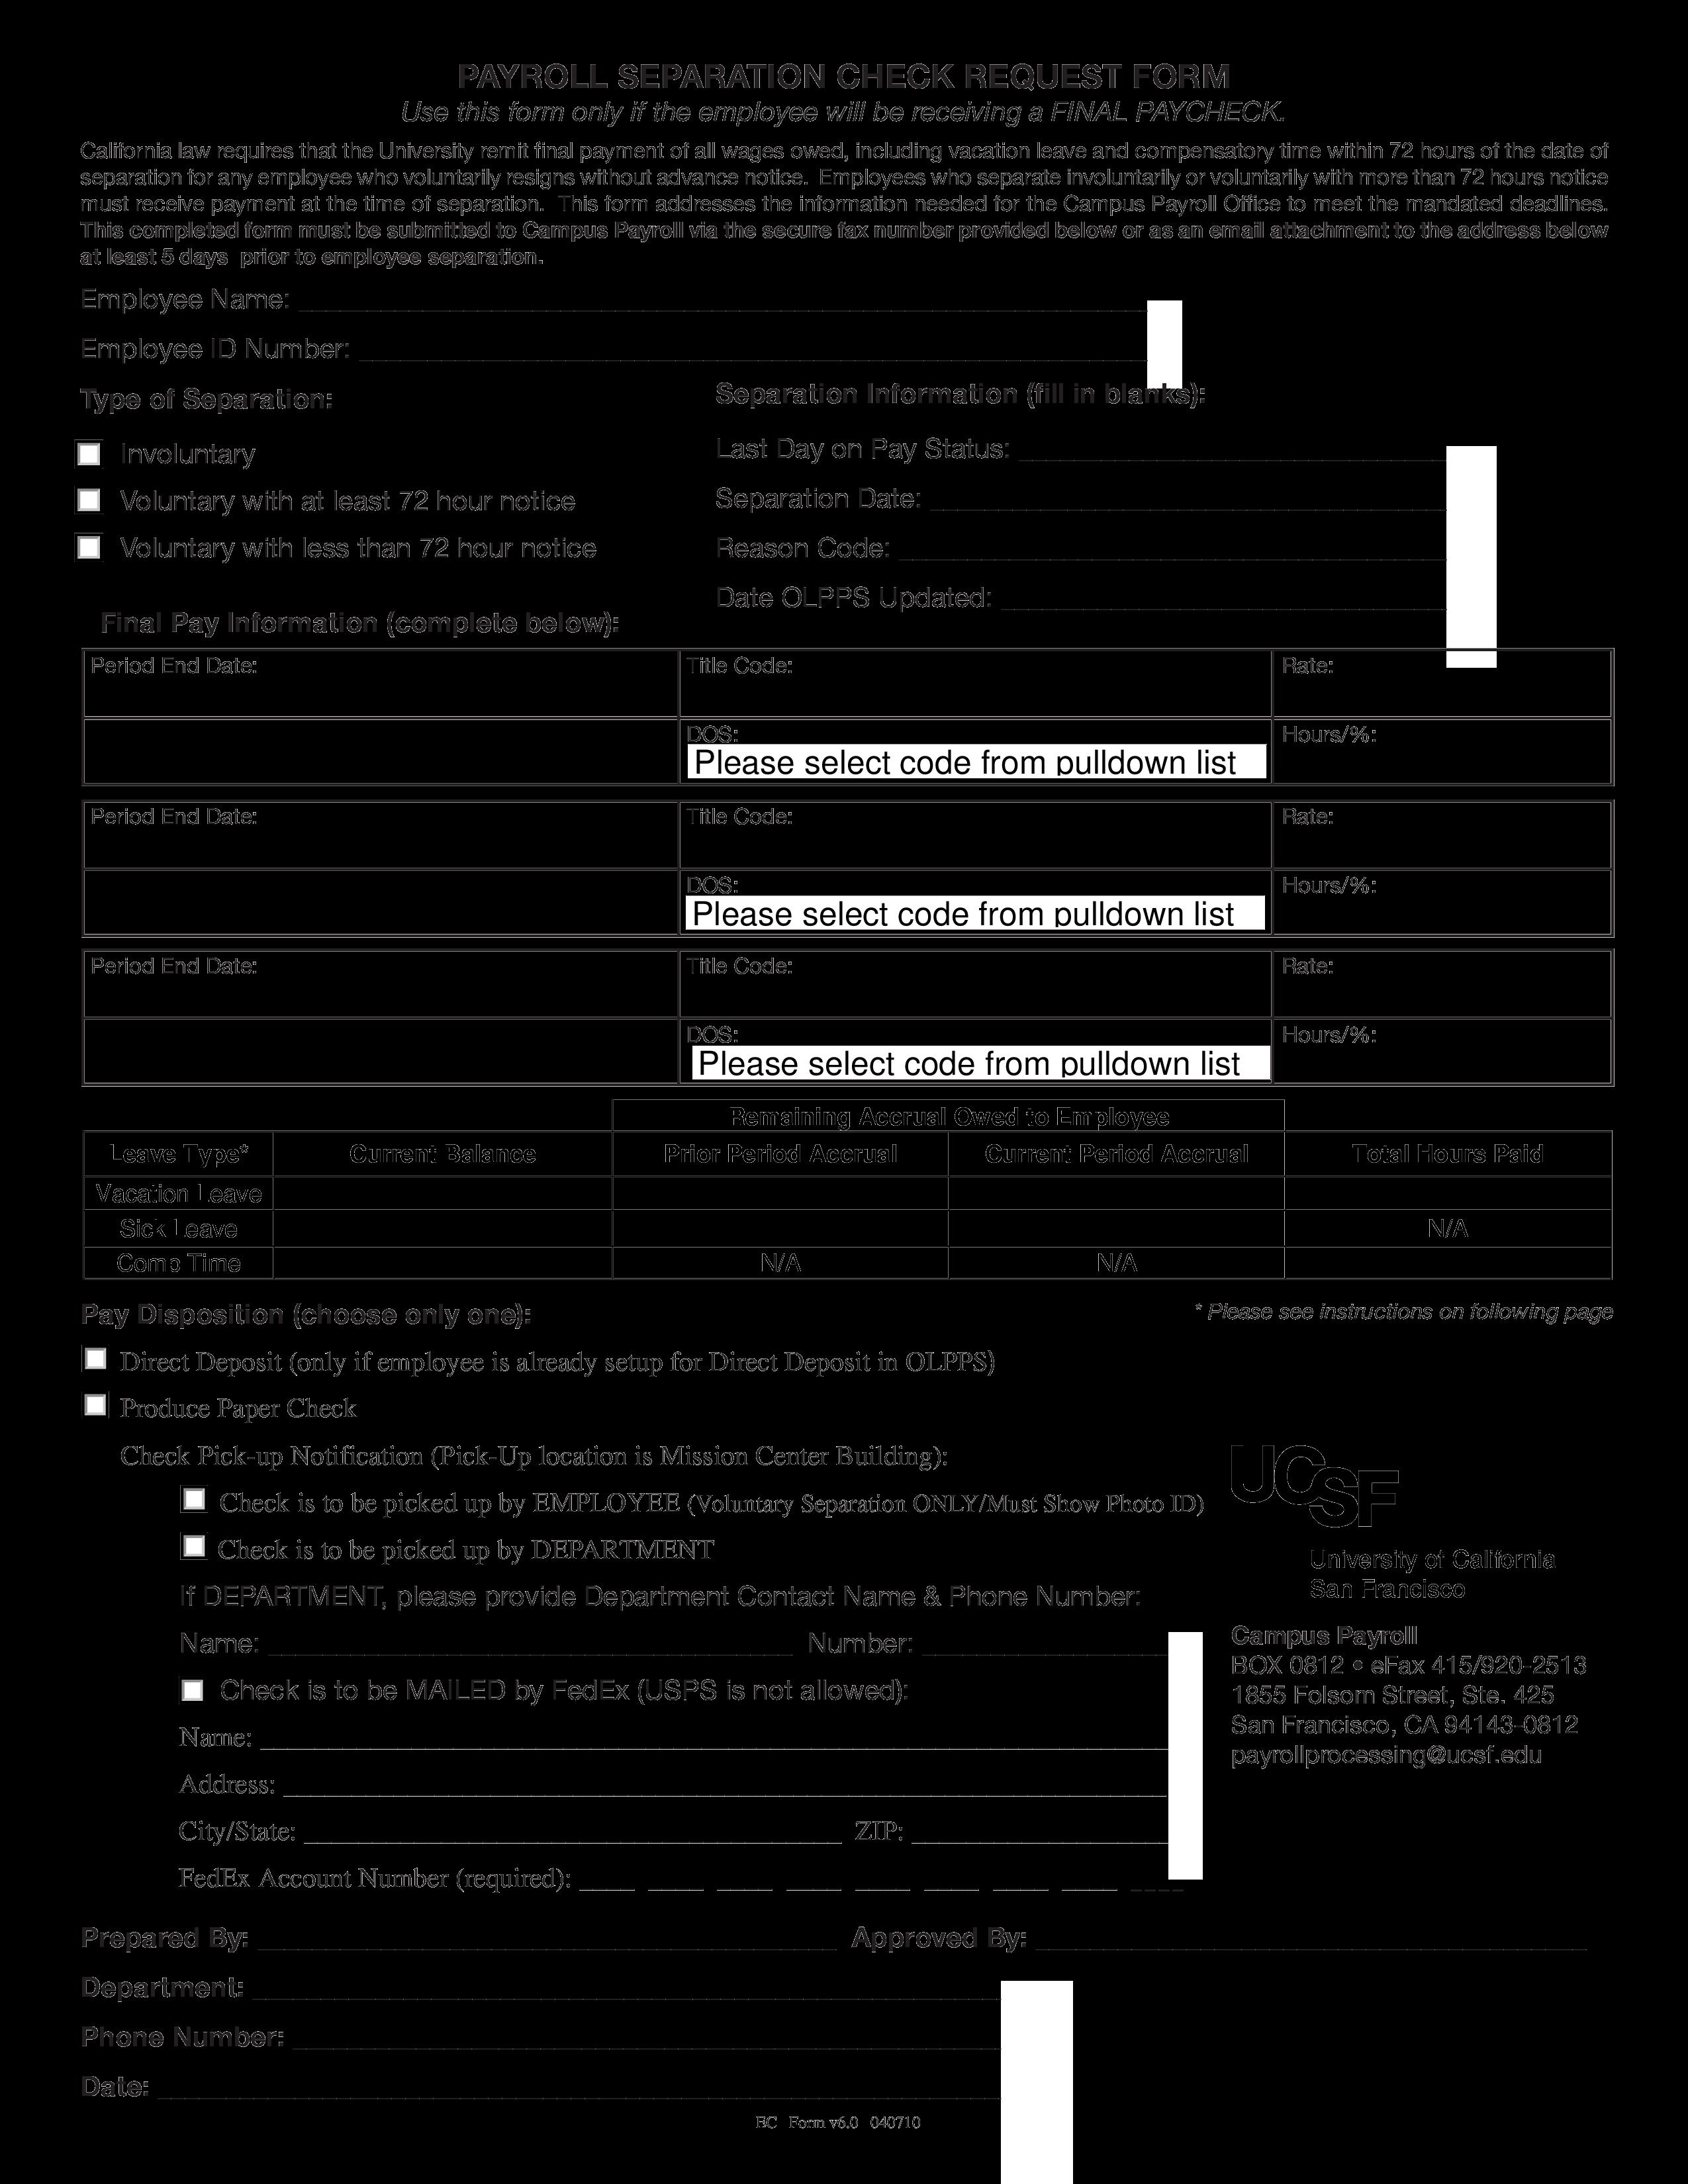 Free Payroll Separation Notice | Templates at allbusinesstemplates.com